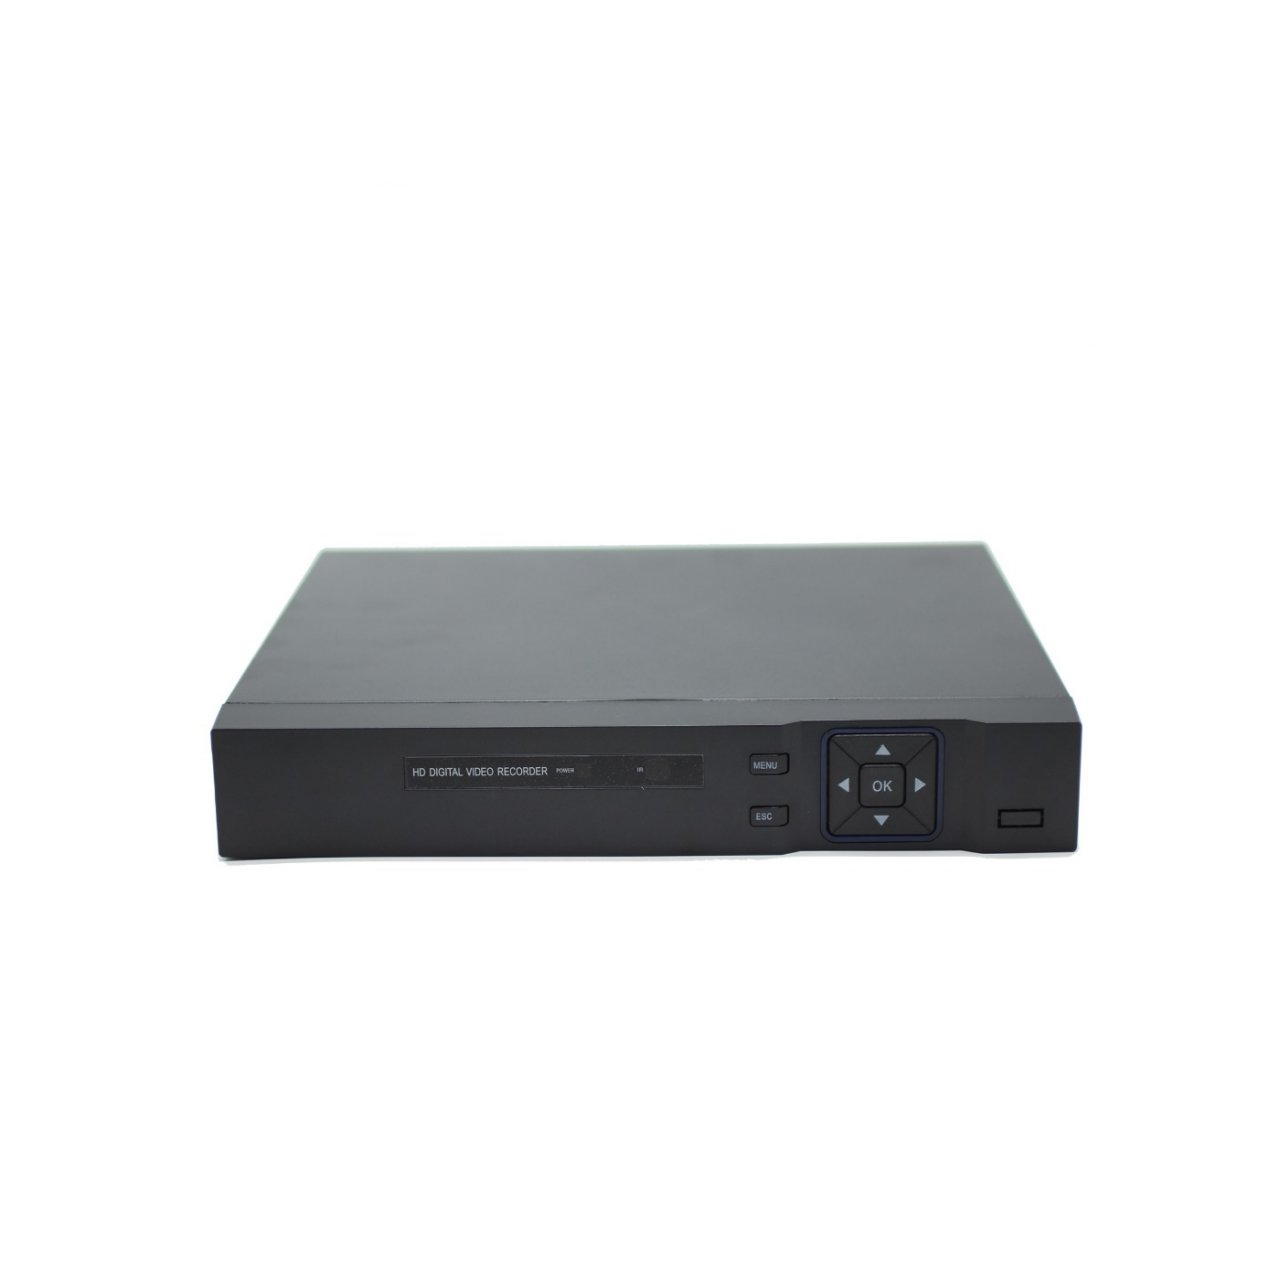 دستگاه DVRهشت کانال 1080N